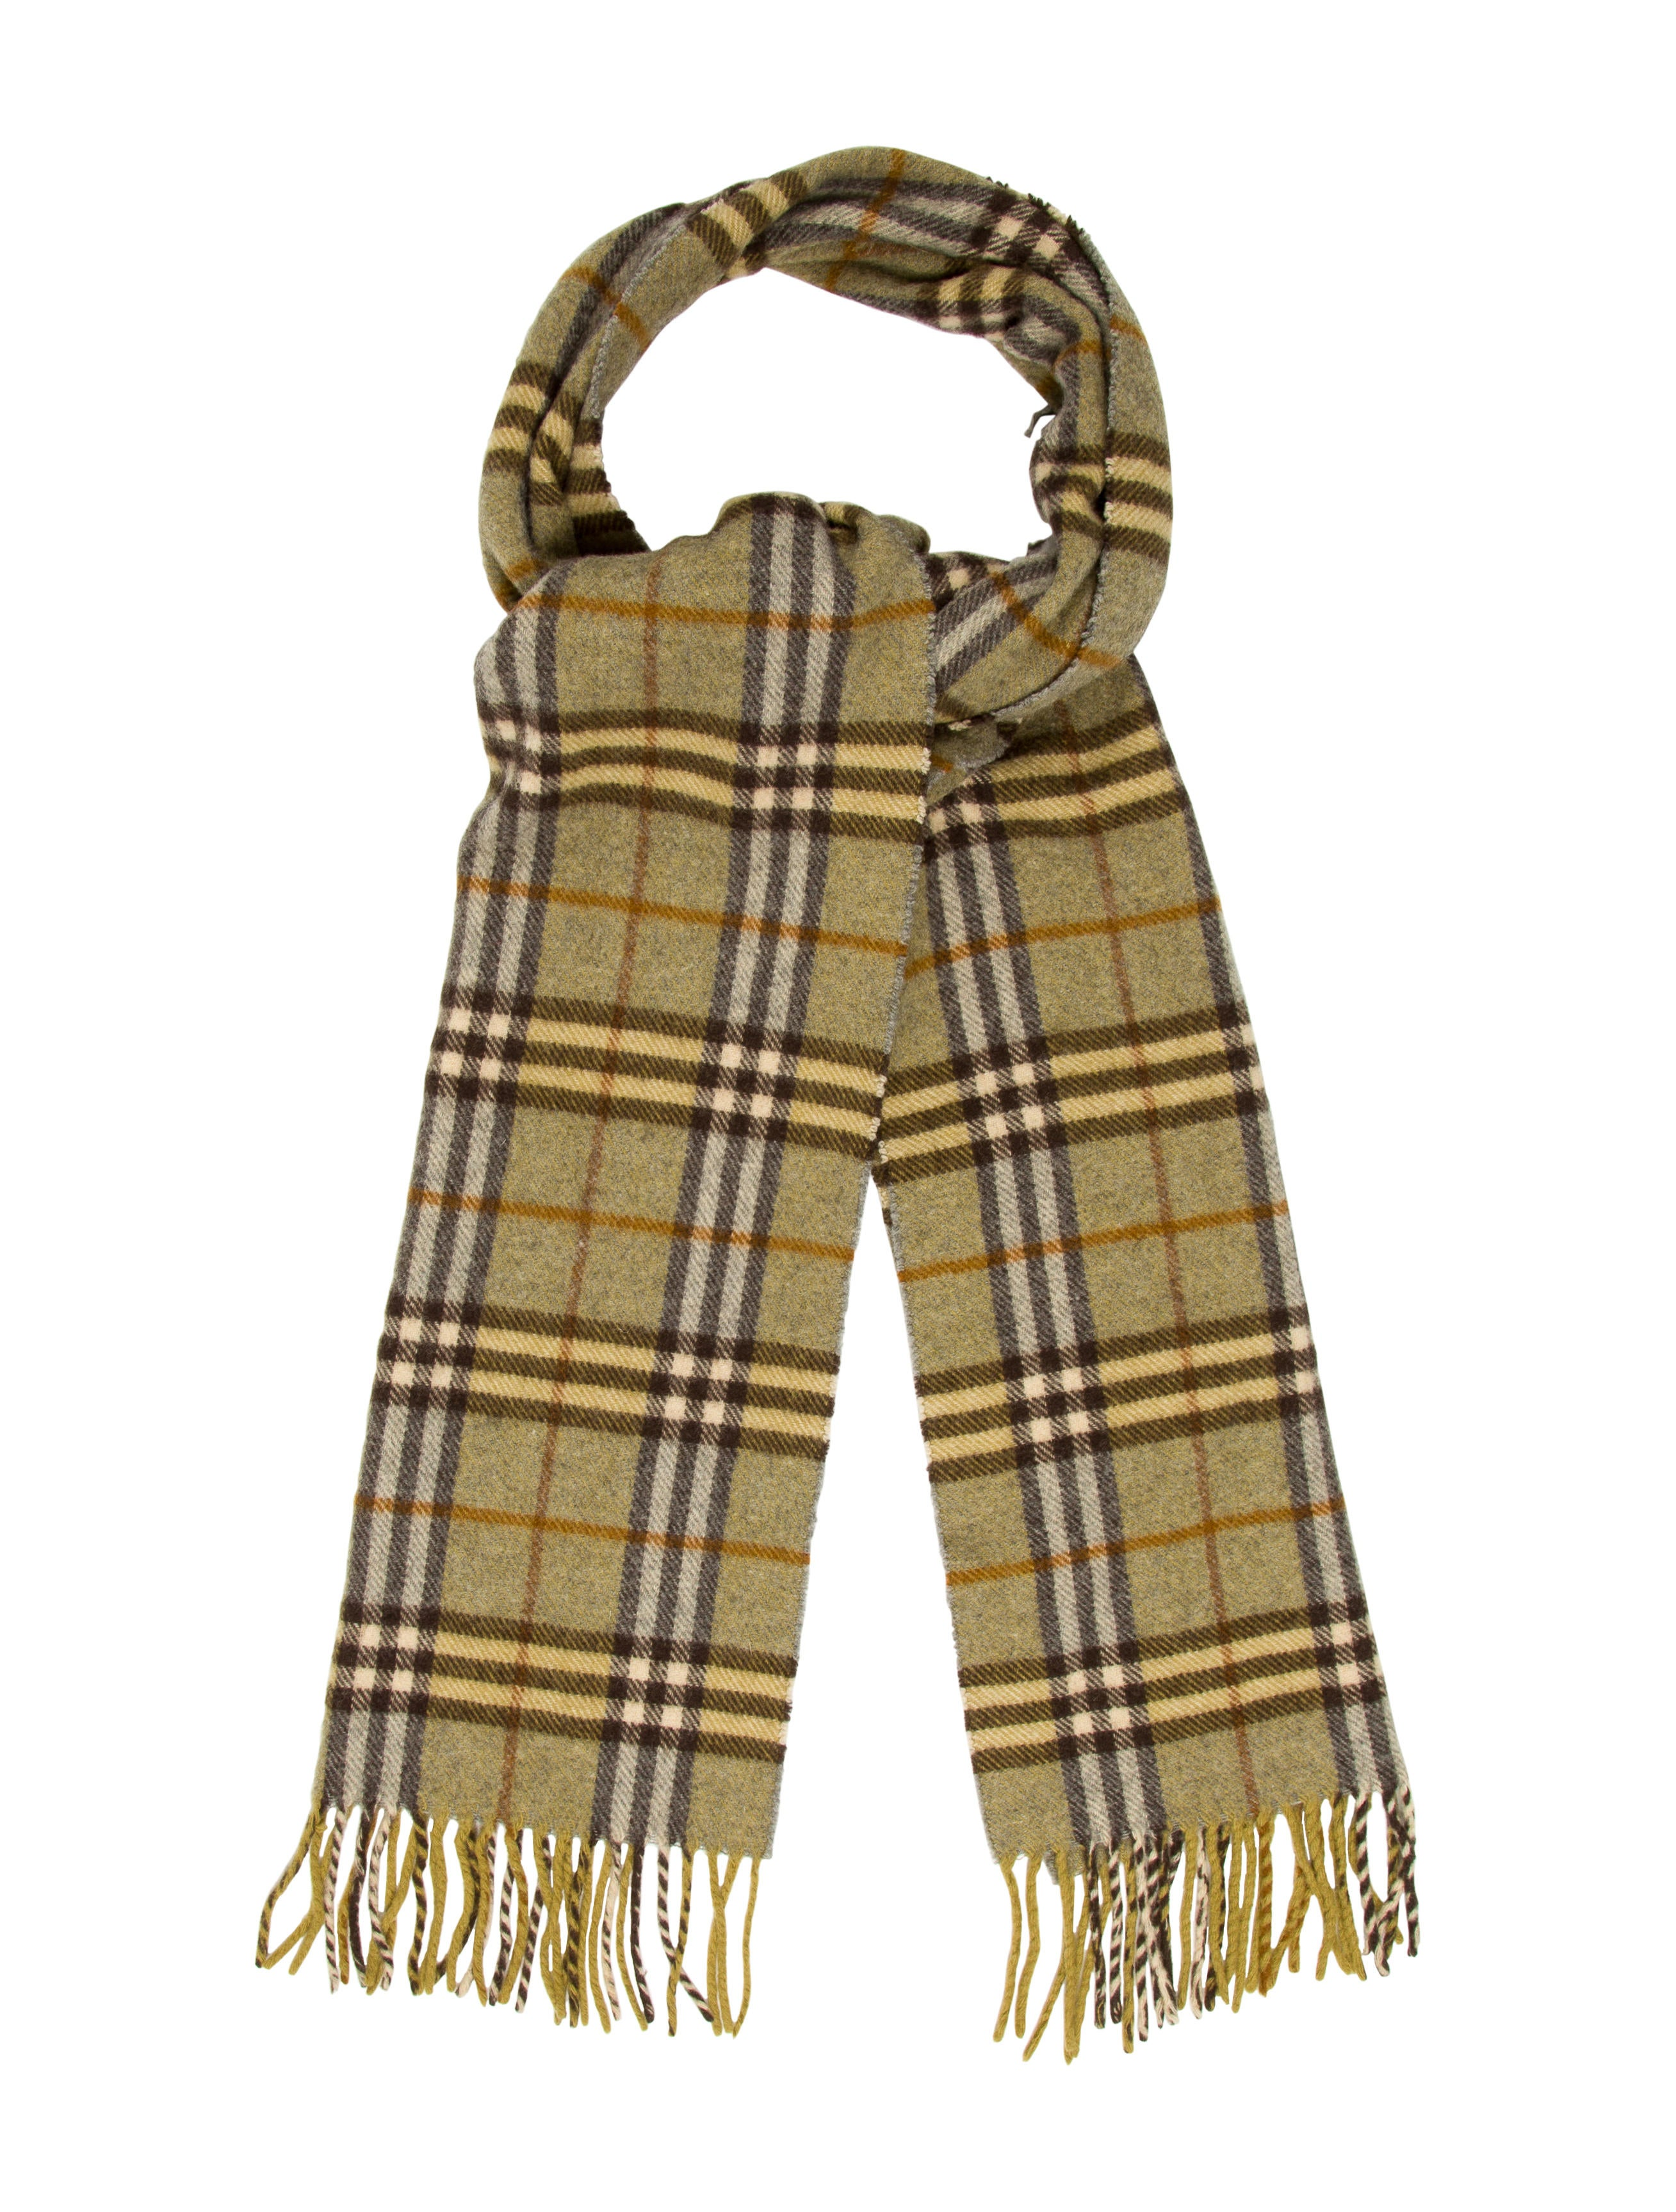 6f5263acf70 Burberry London Wool Nova Check Scarf - Accessories - WBURL23571